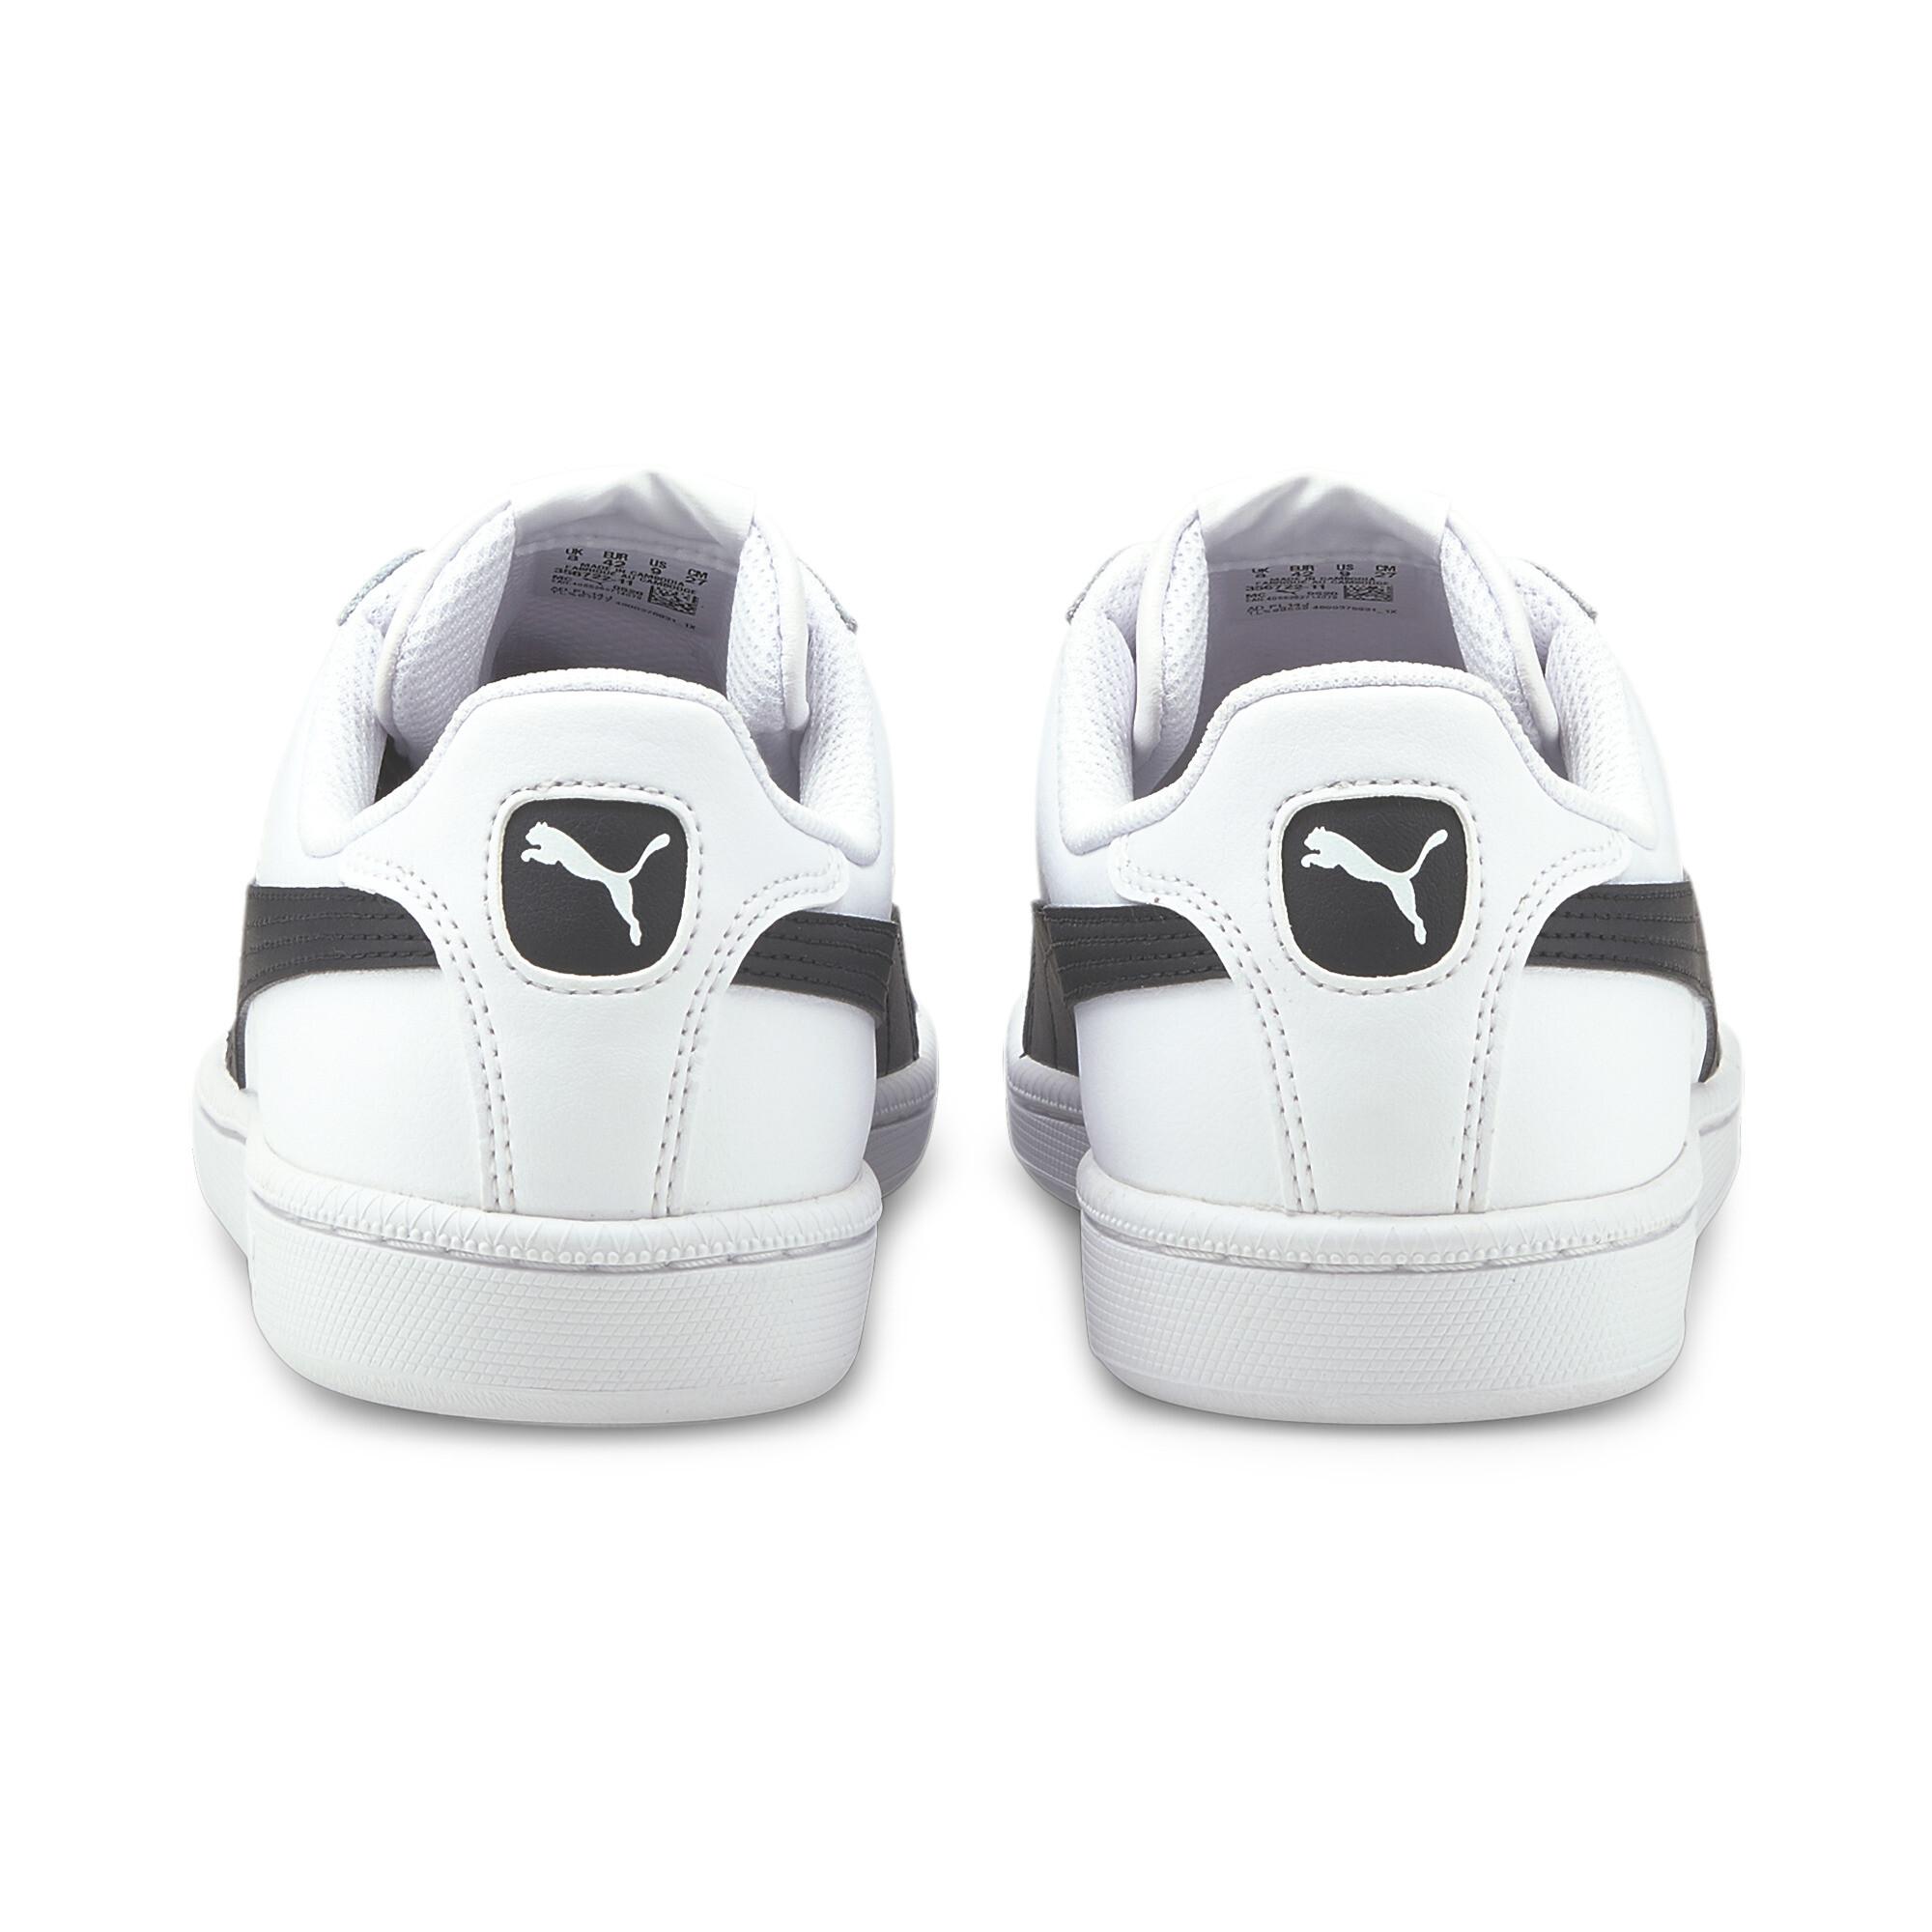 PUMA-Smash-Trainers-Schuhe-Sneakers-Sport-Classics-Unisex-Neu Indexbild 8